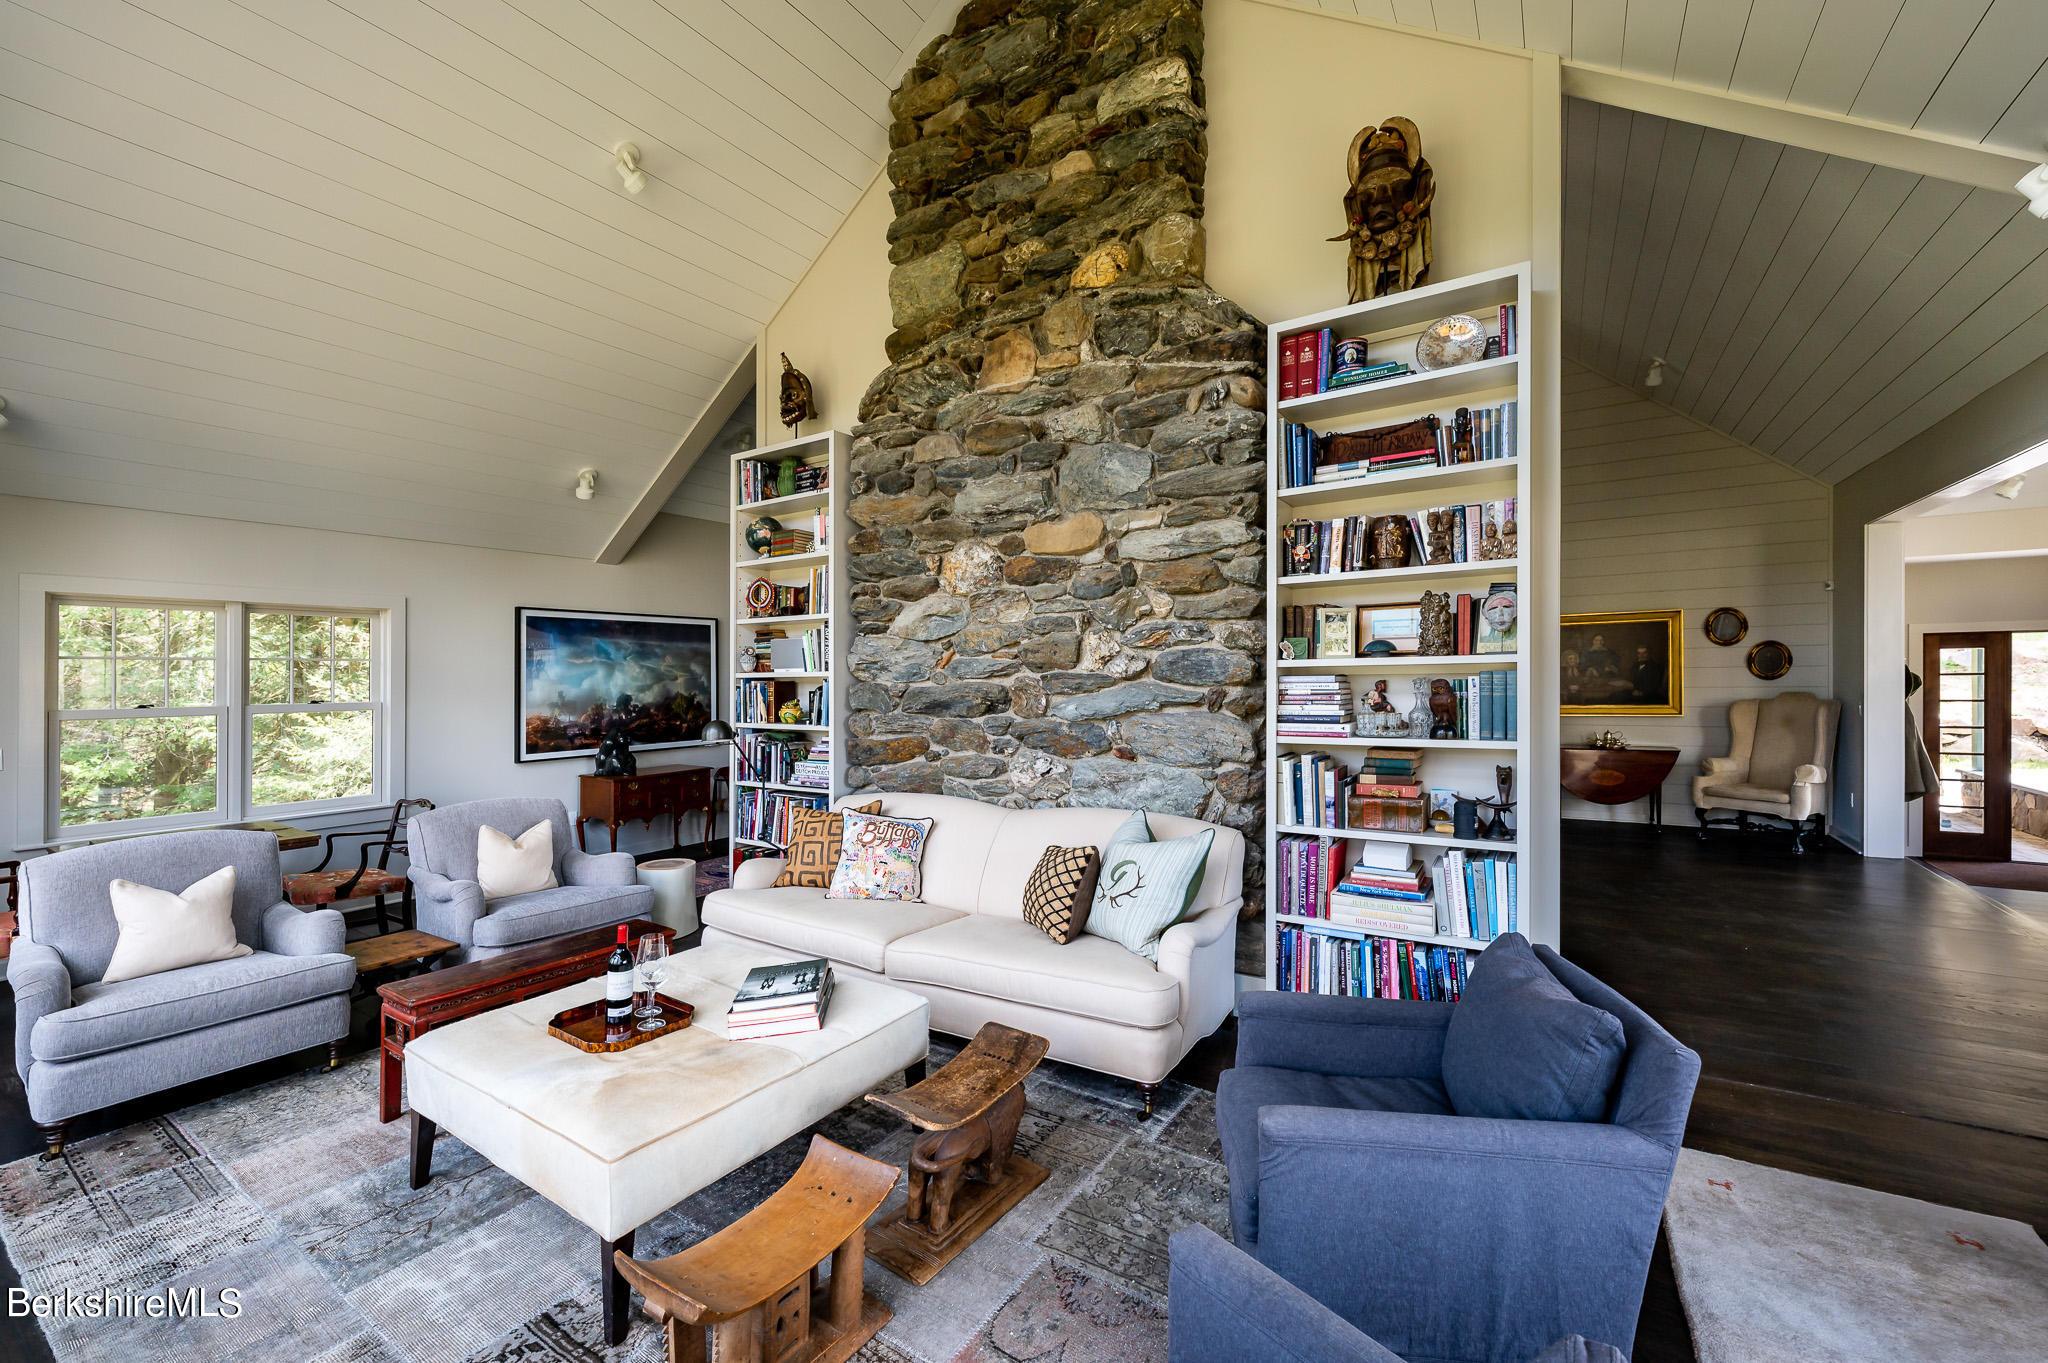 Property located at 379 West St Mt Washington MA 01258 photo